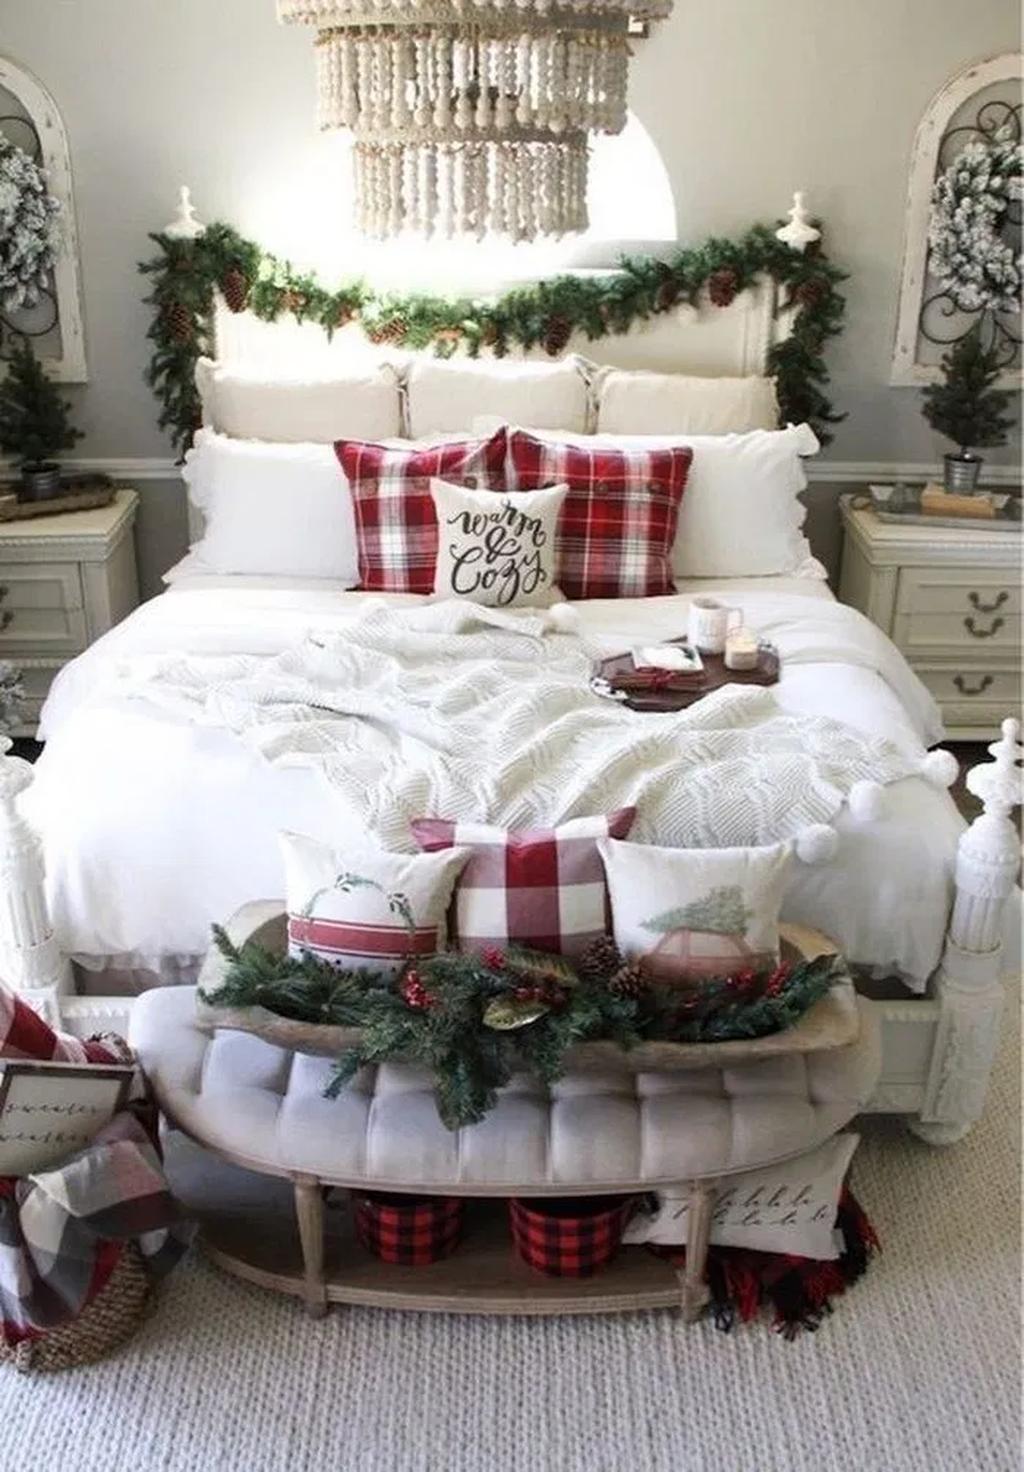 Fabulous Winter Bedroom Decor Ideas You Should Copy Now in